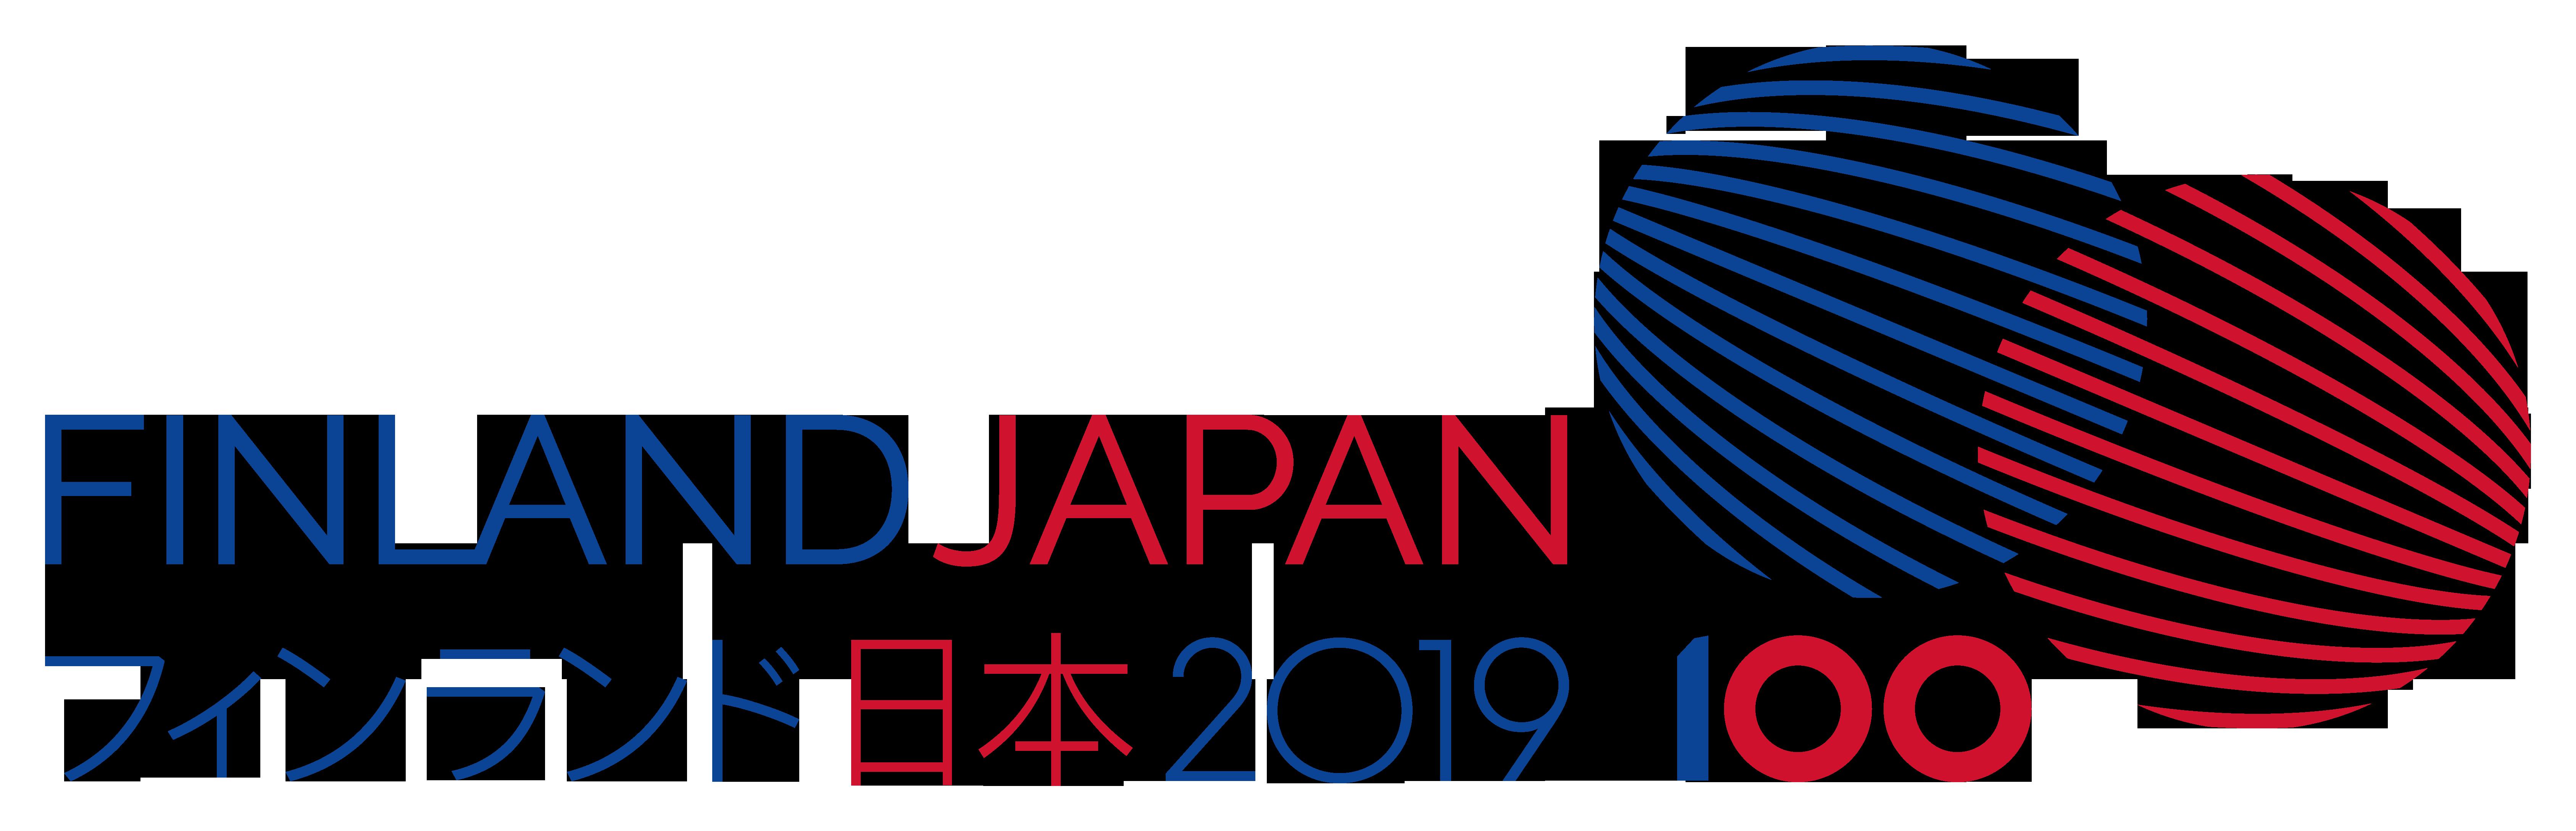 https://www.montreuxjazz.jp/control2/wp-content/uploads/2019/04/Finland_Japan_100_Eng_Kanji_twocolor_horizontal.png